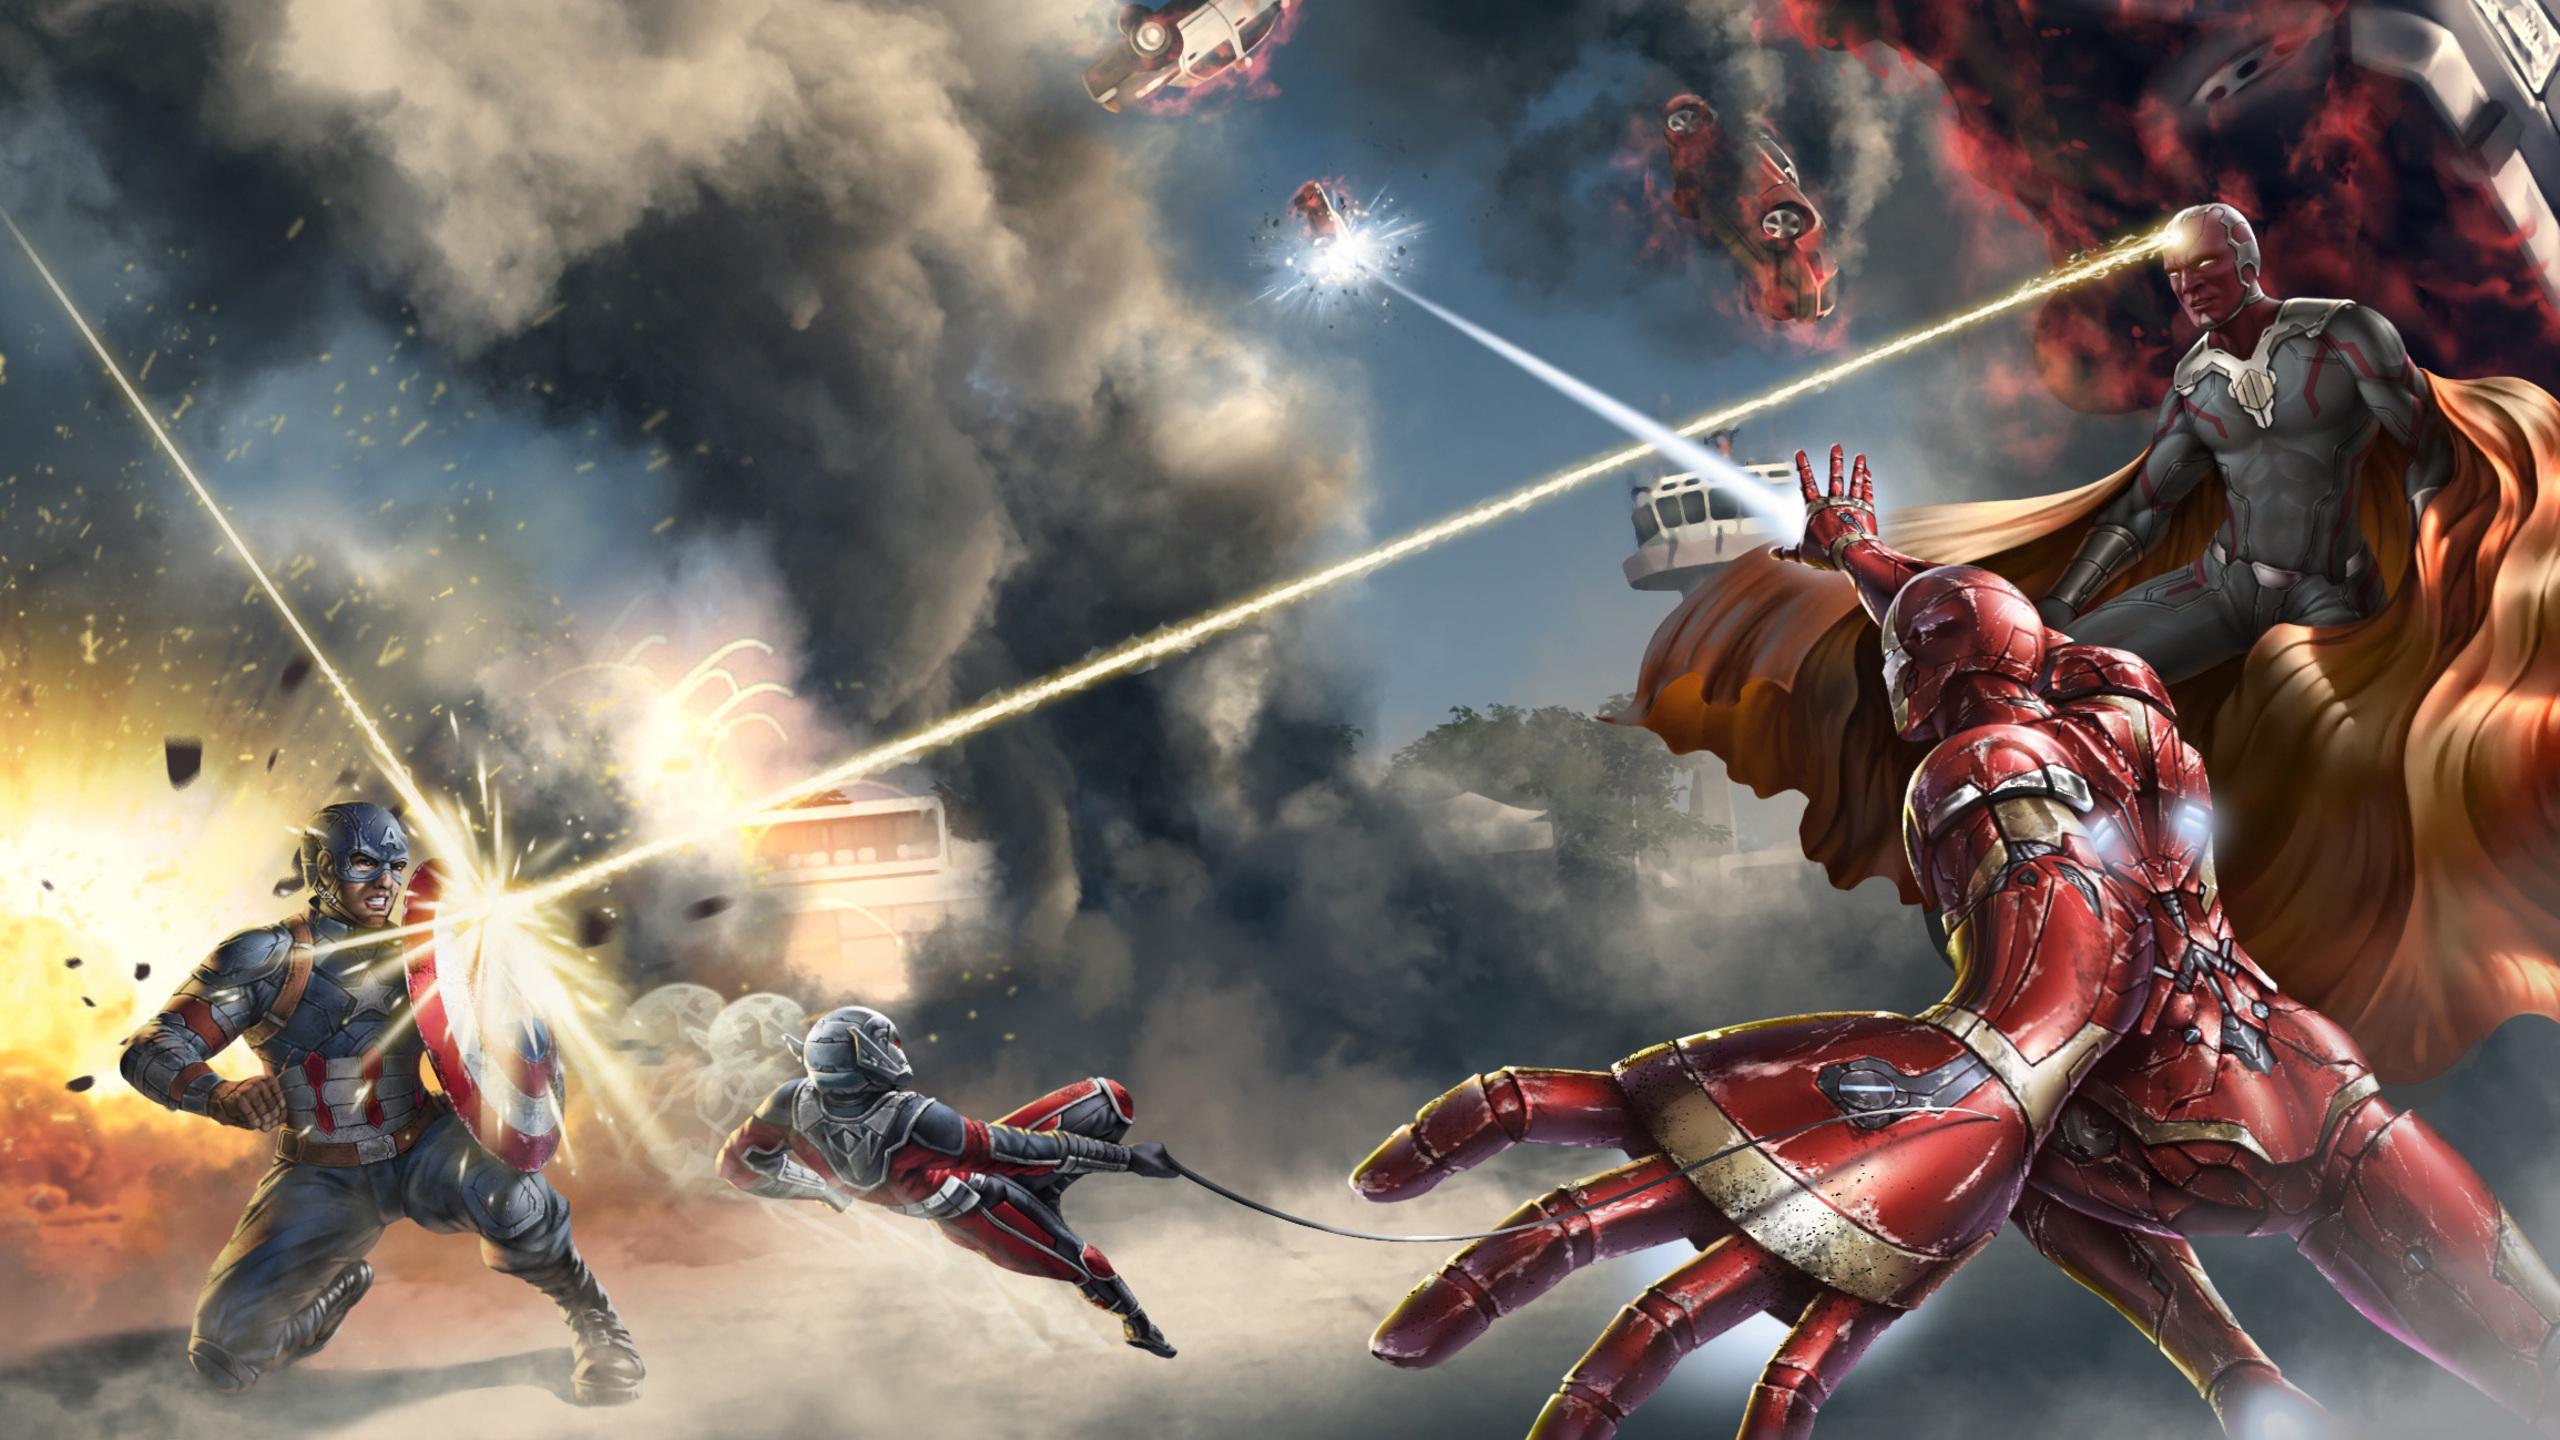 2560x1440 Captain America Civil War Art 1440p Resolution Hd 4k